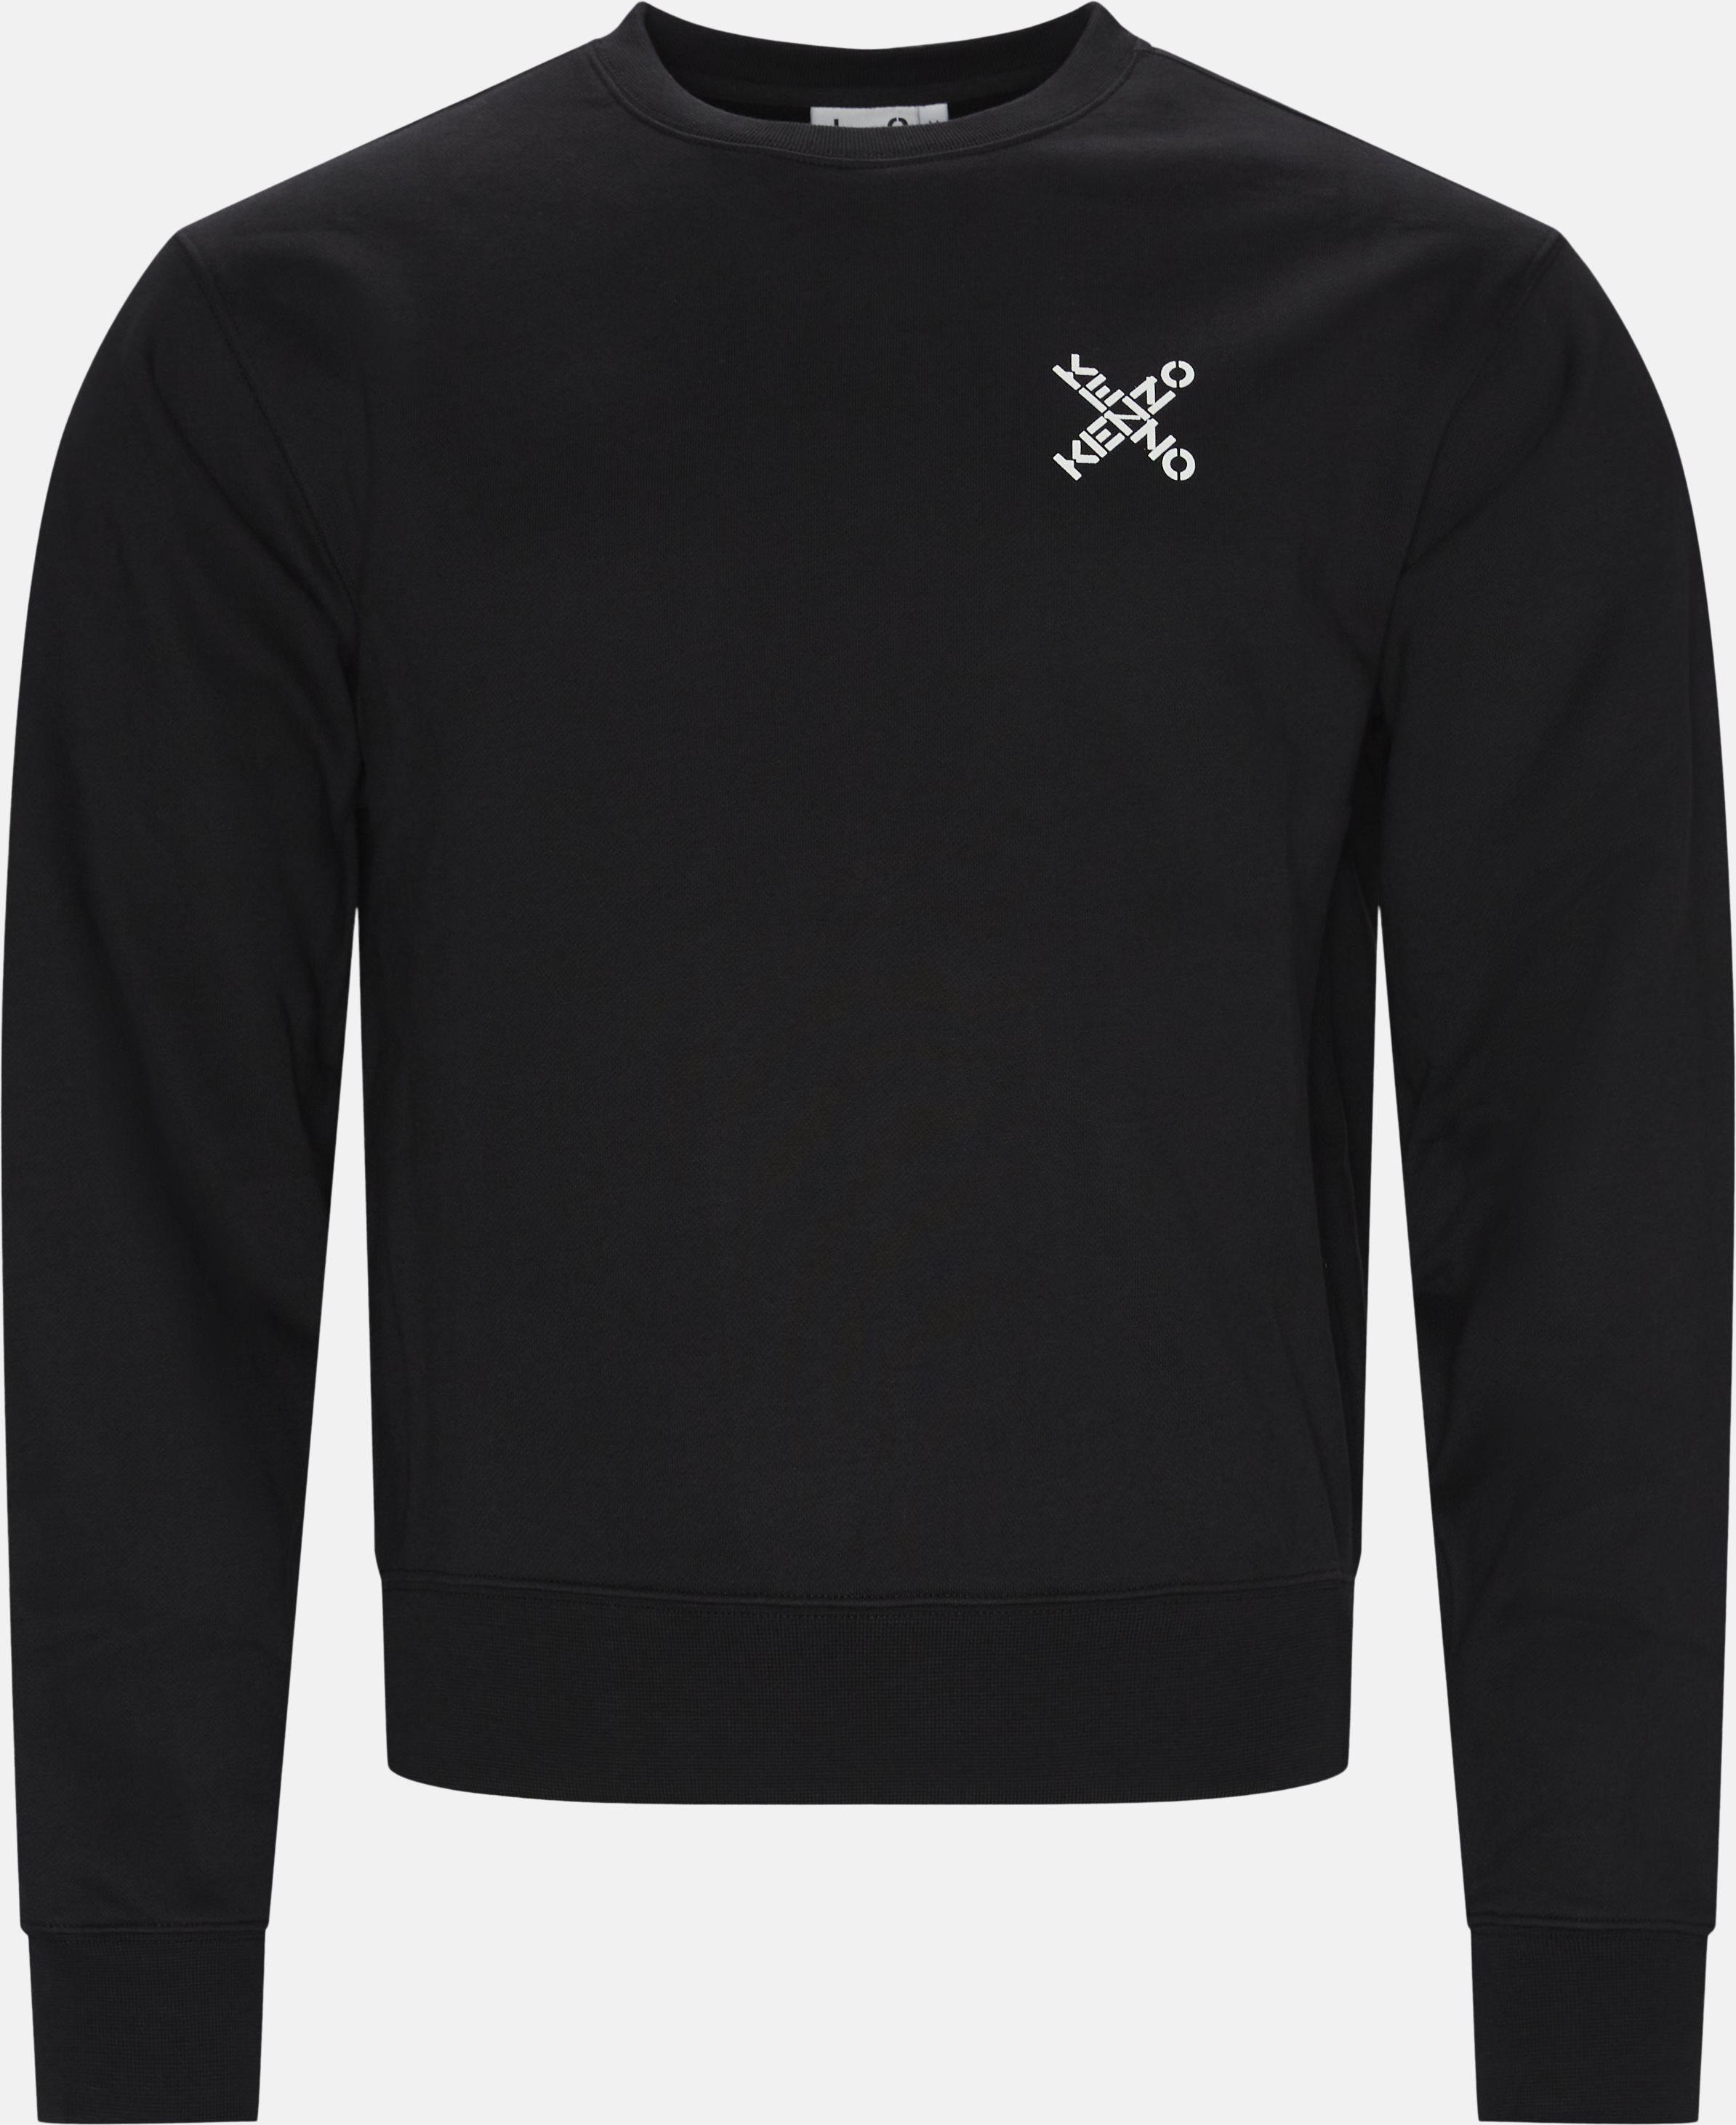 Sweatshirts - Casual fit - Black